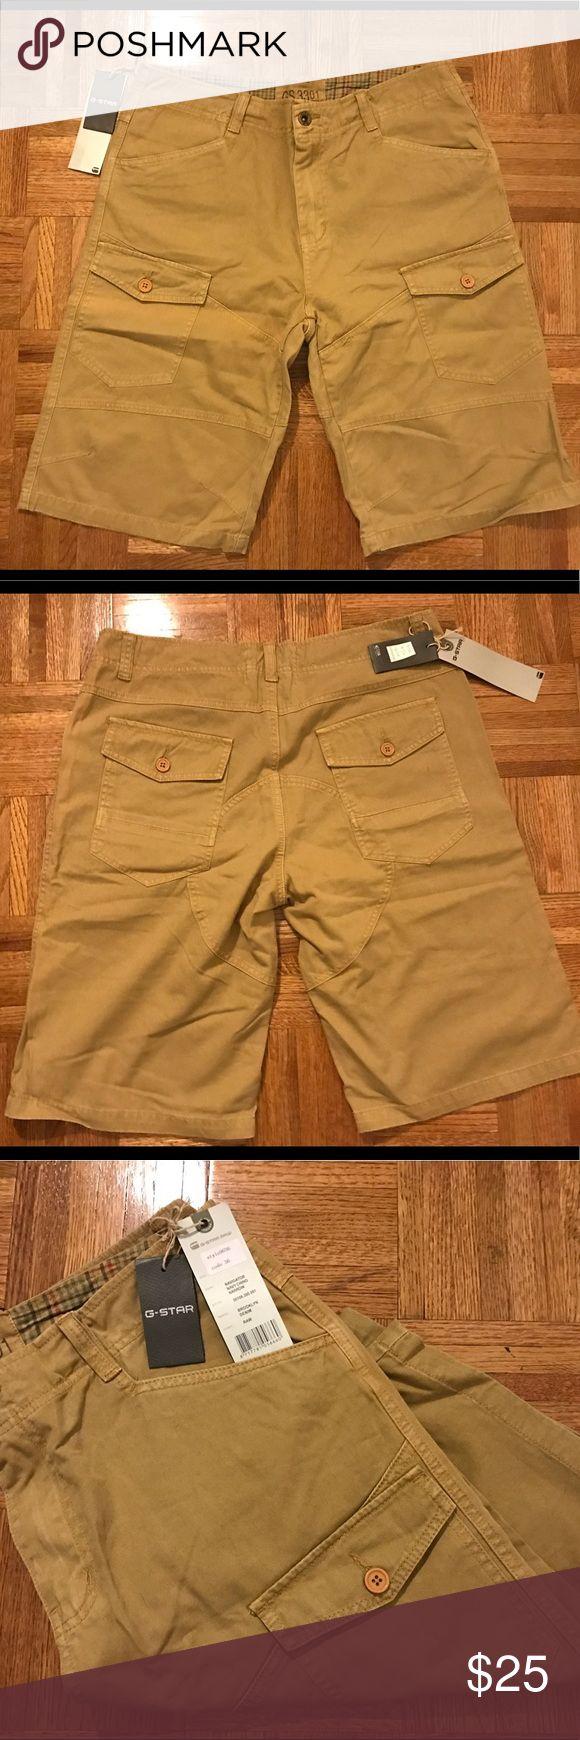 Men's G Star Raw cargo style shorts G Star Raw men's cargo style shorts NWT 36 waist 32 long chino fabric in raw khaki color G Star Raw Shorts